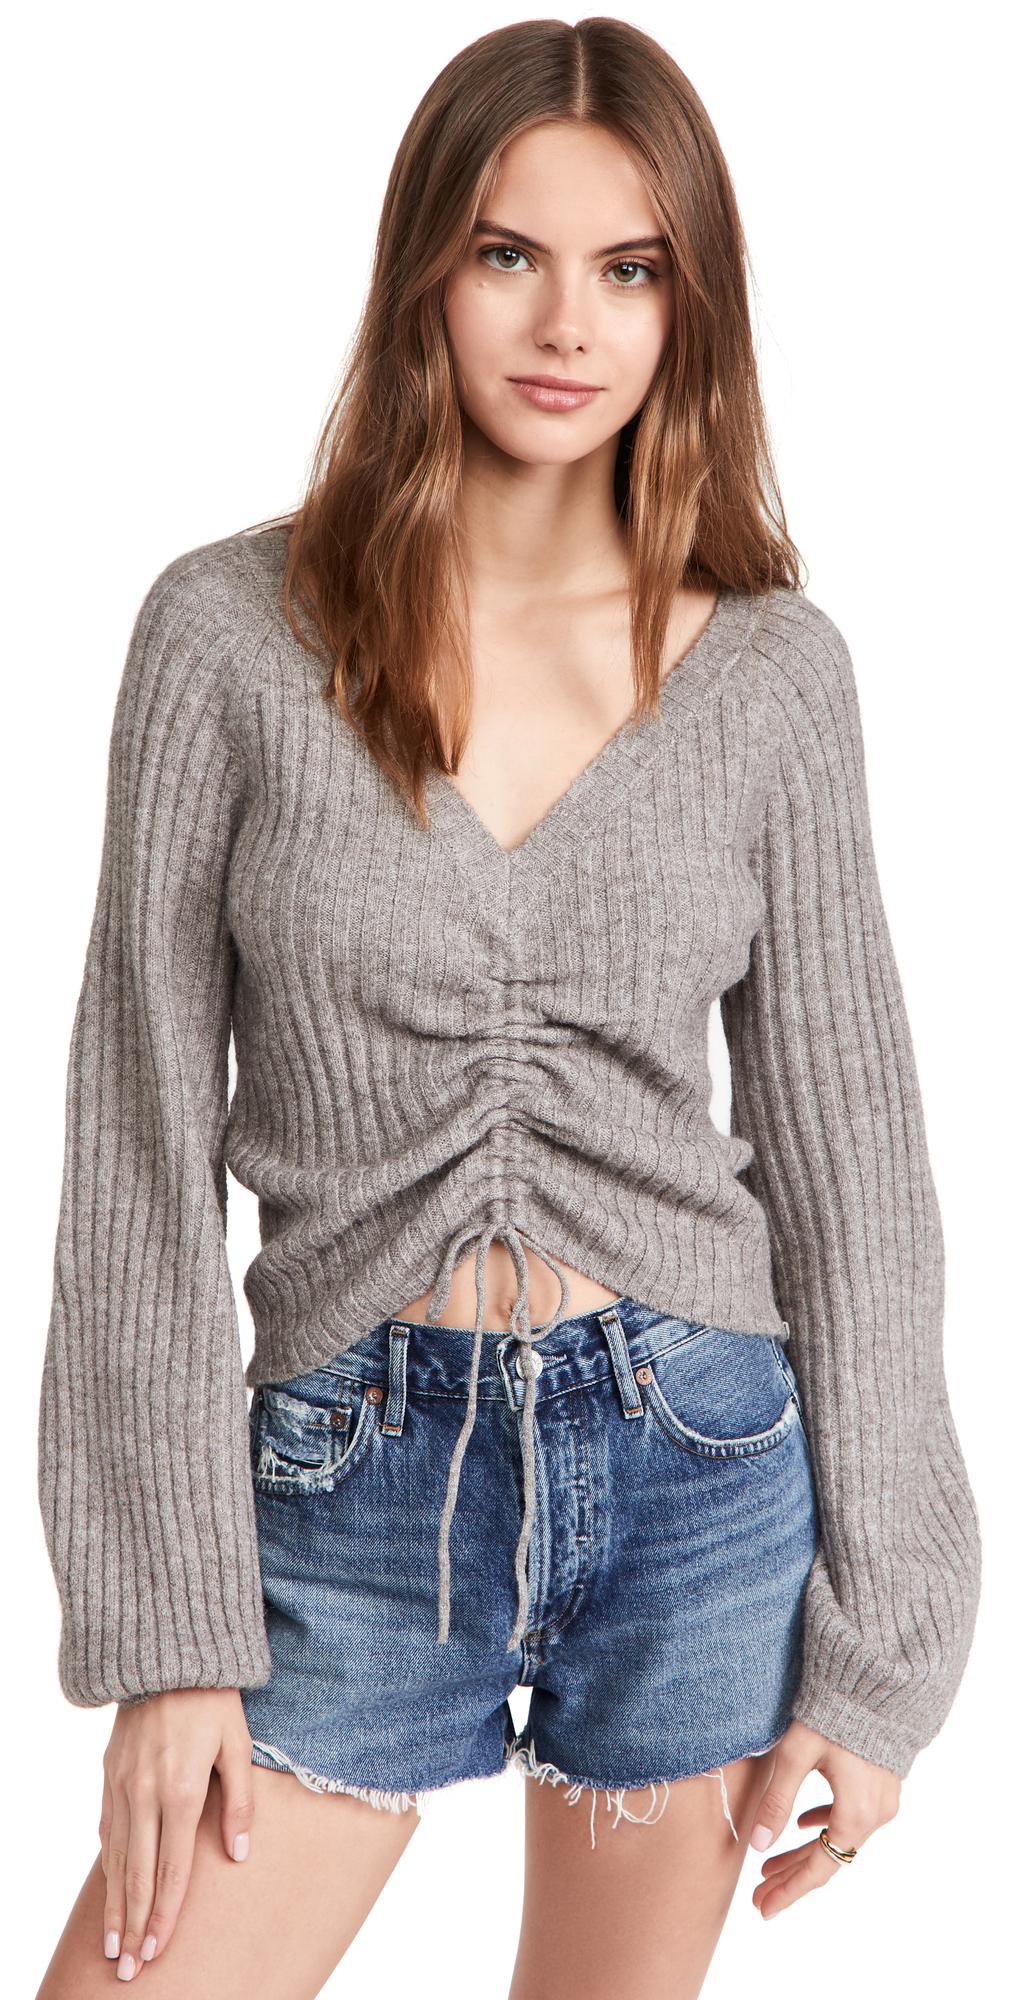 Make It Short Sweater